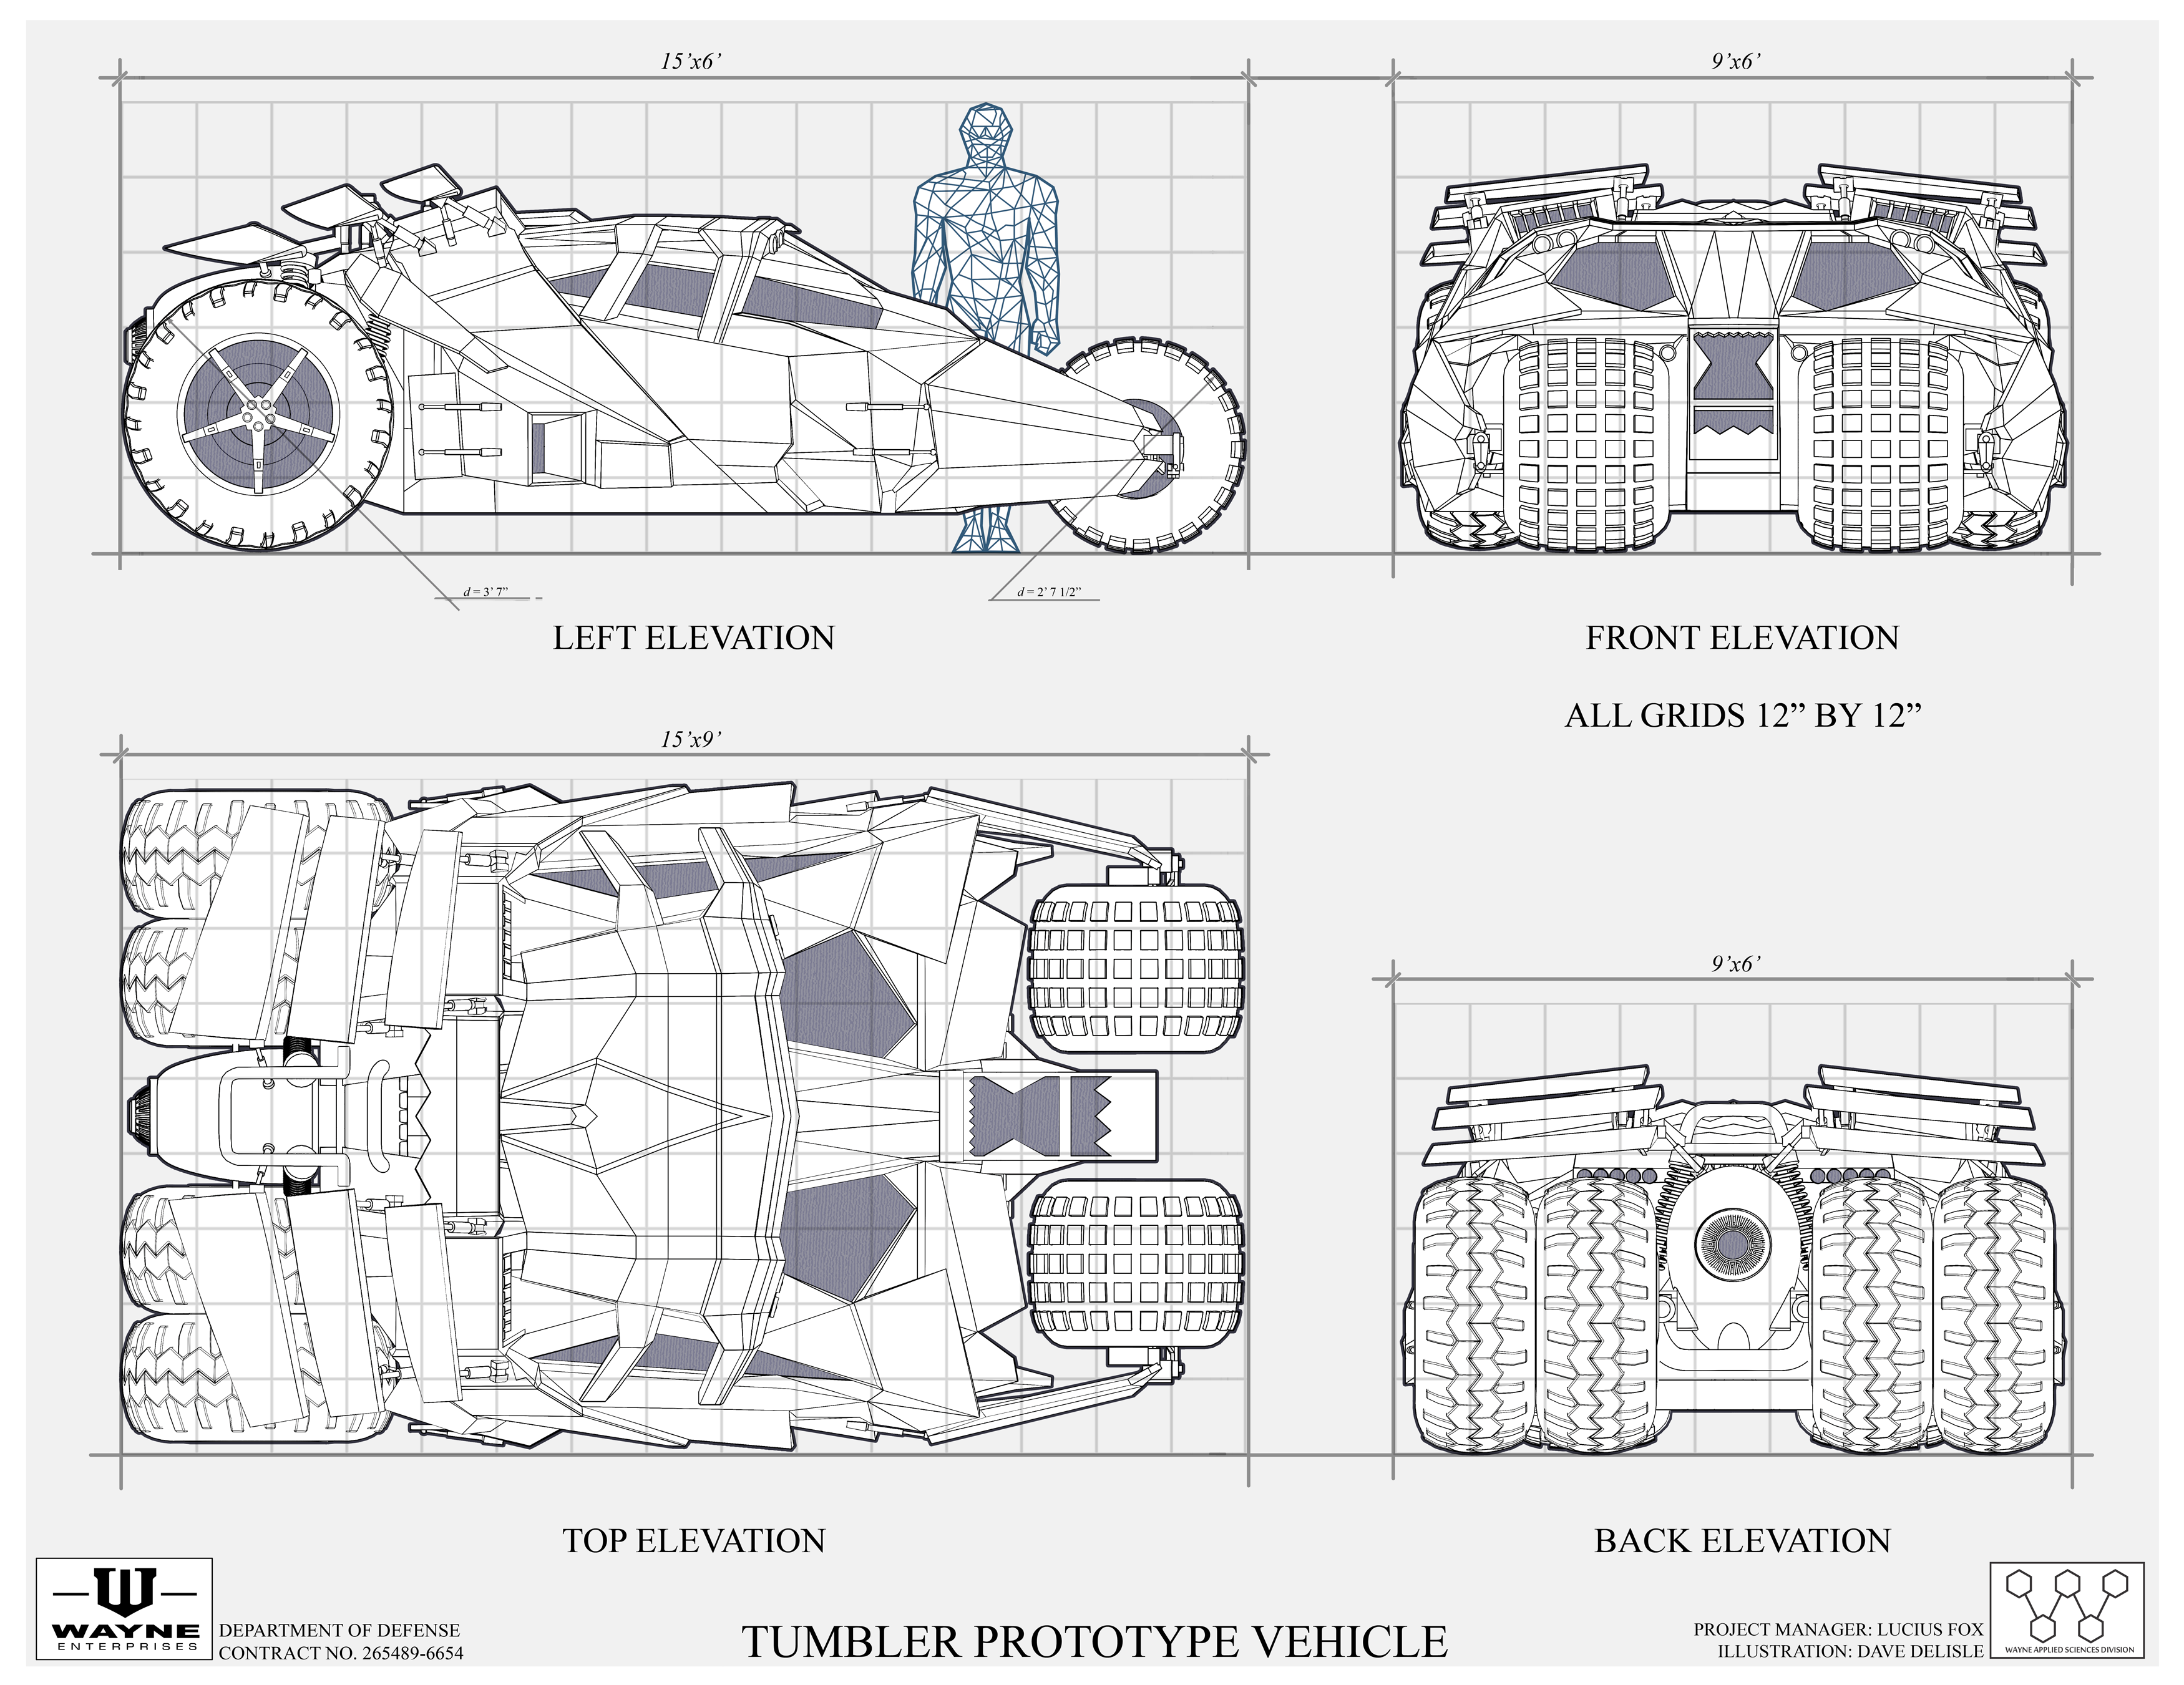 tumbler batmobile blueprint geek stuff pinterest batmobile bat man